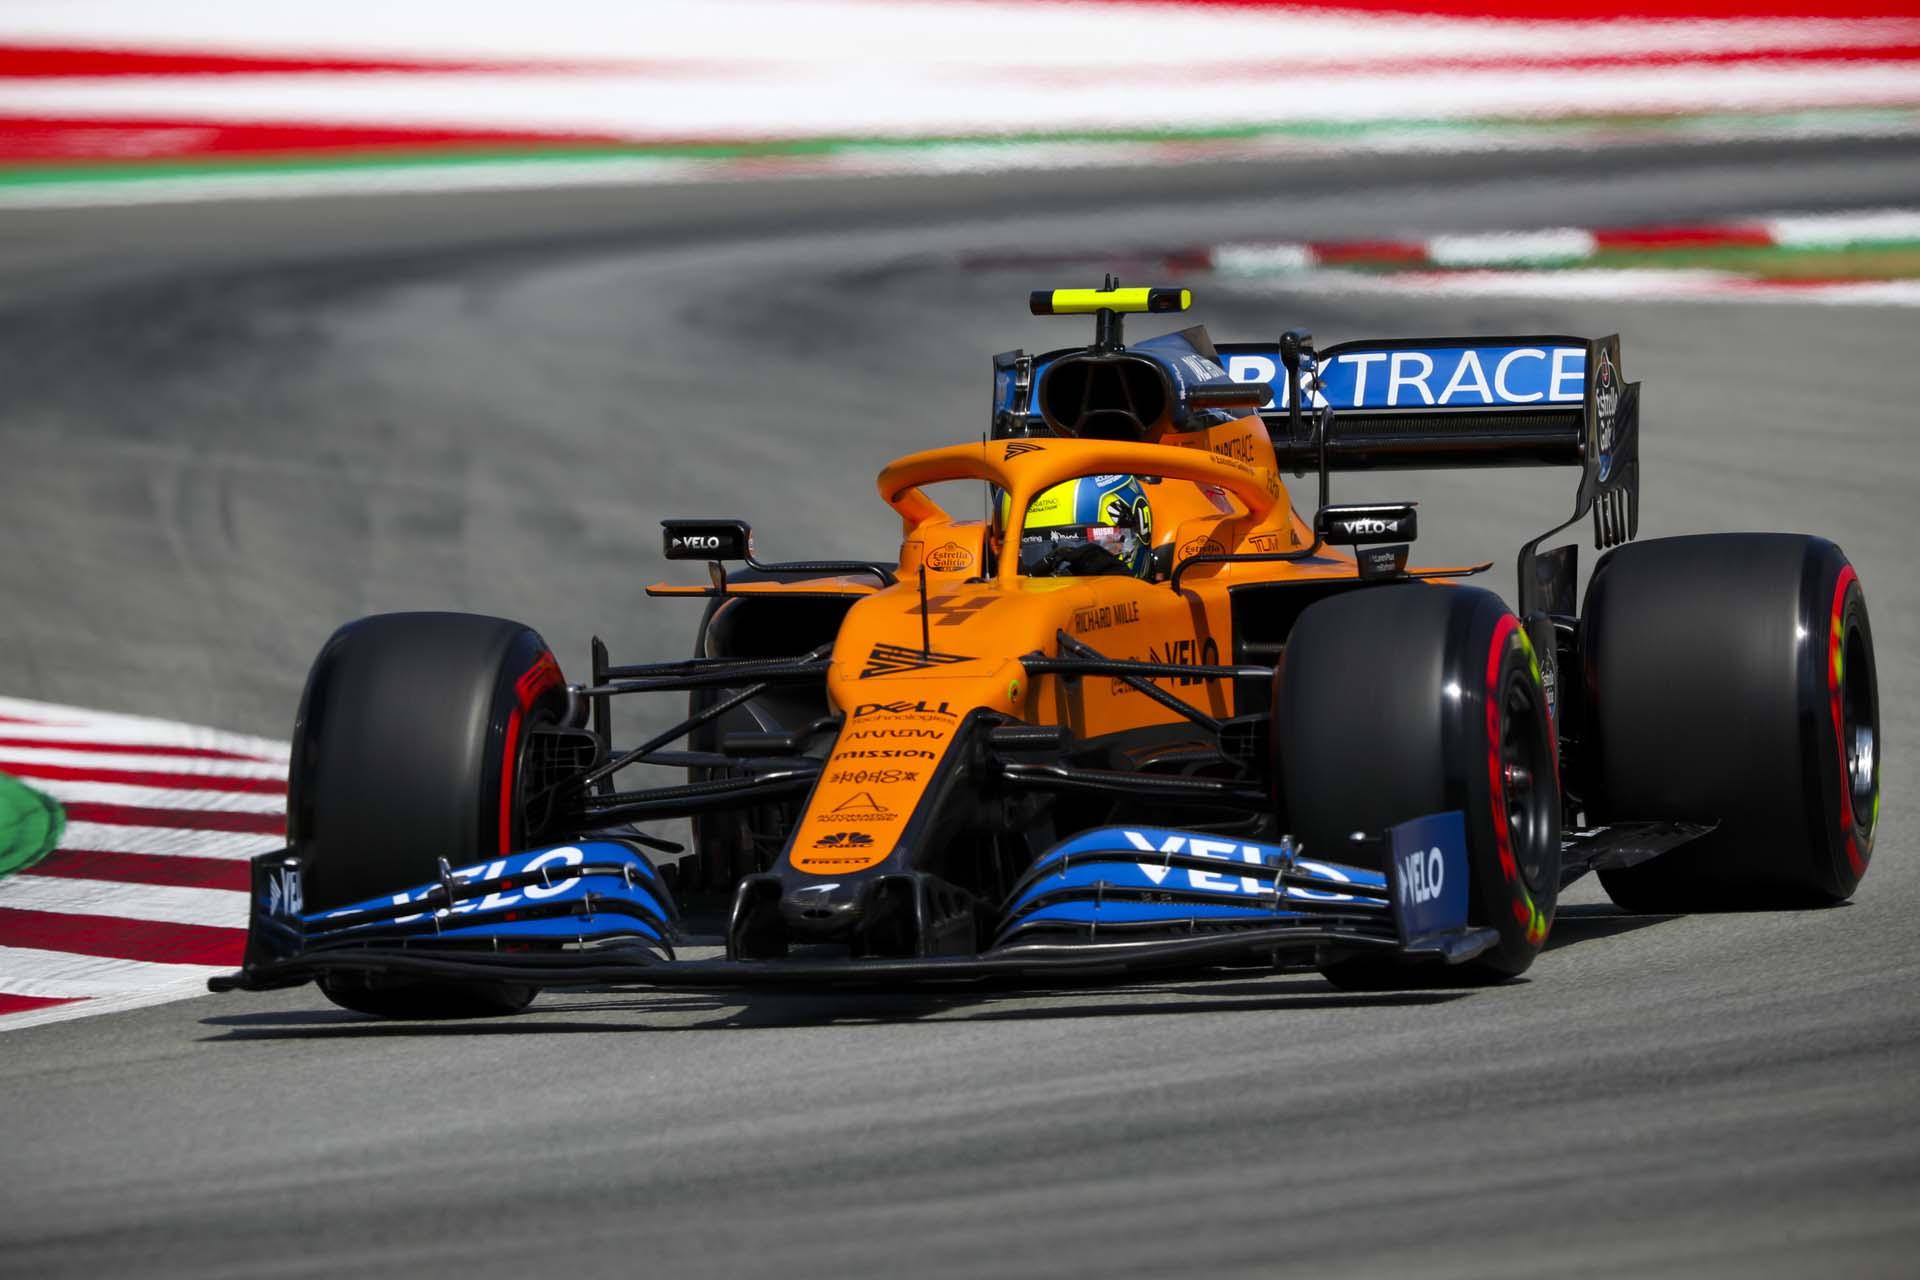 Lando Norris, McLaren MCL35, enters a corner